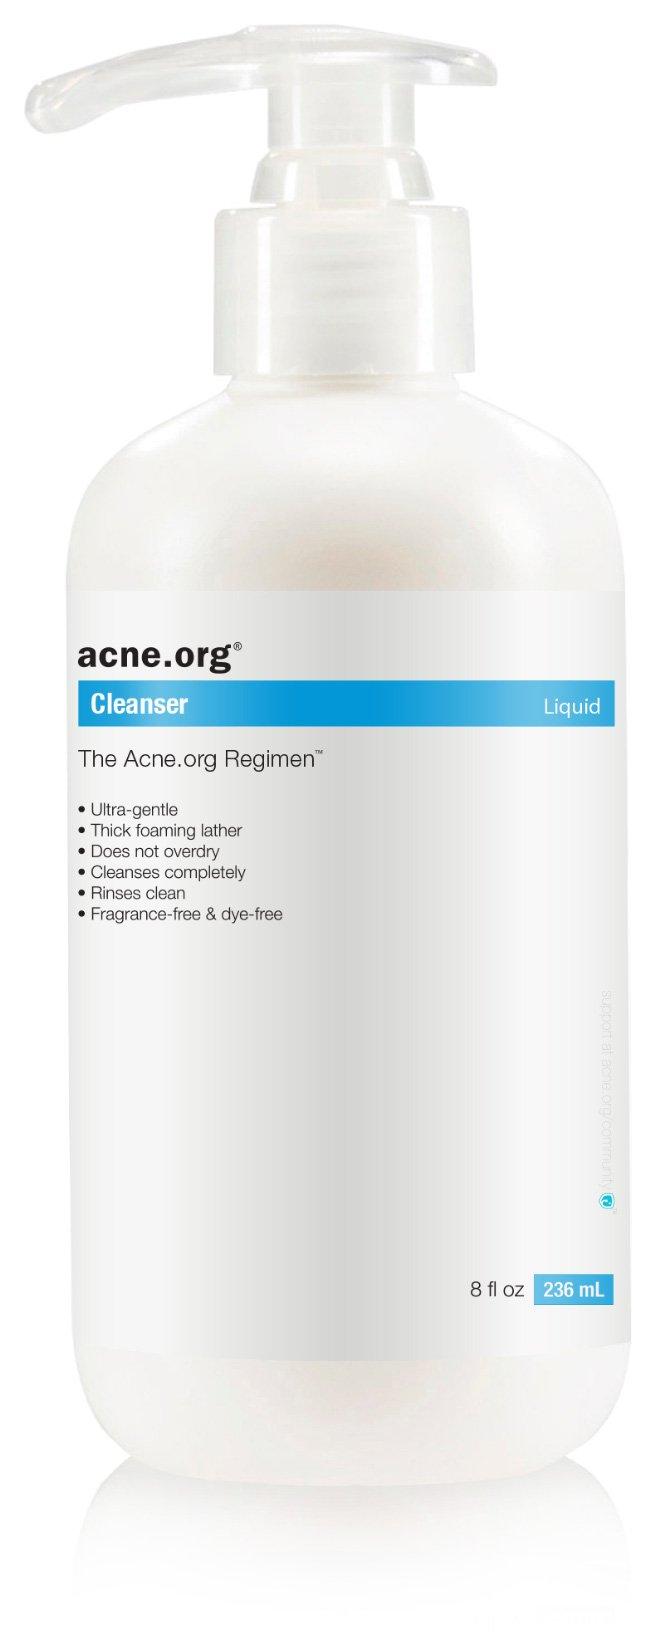 Acne.org 8 oz. Cleanser